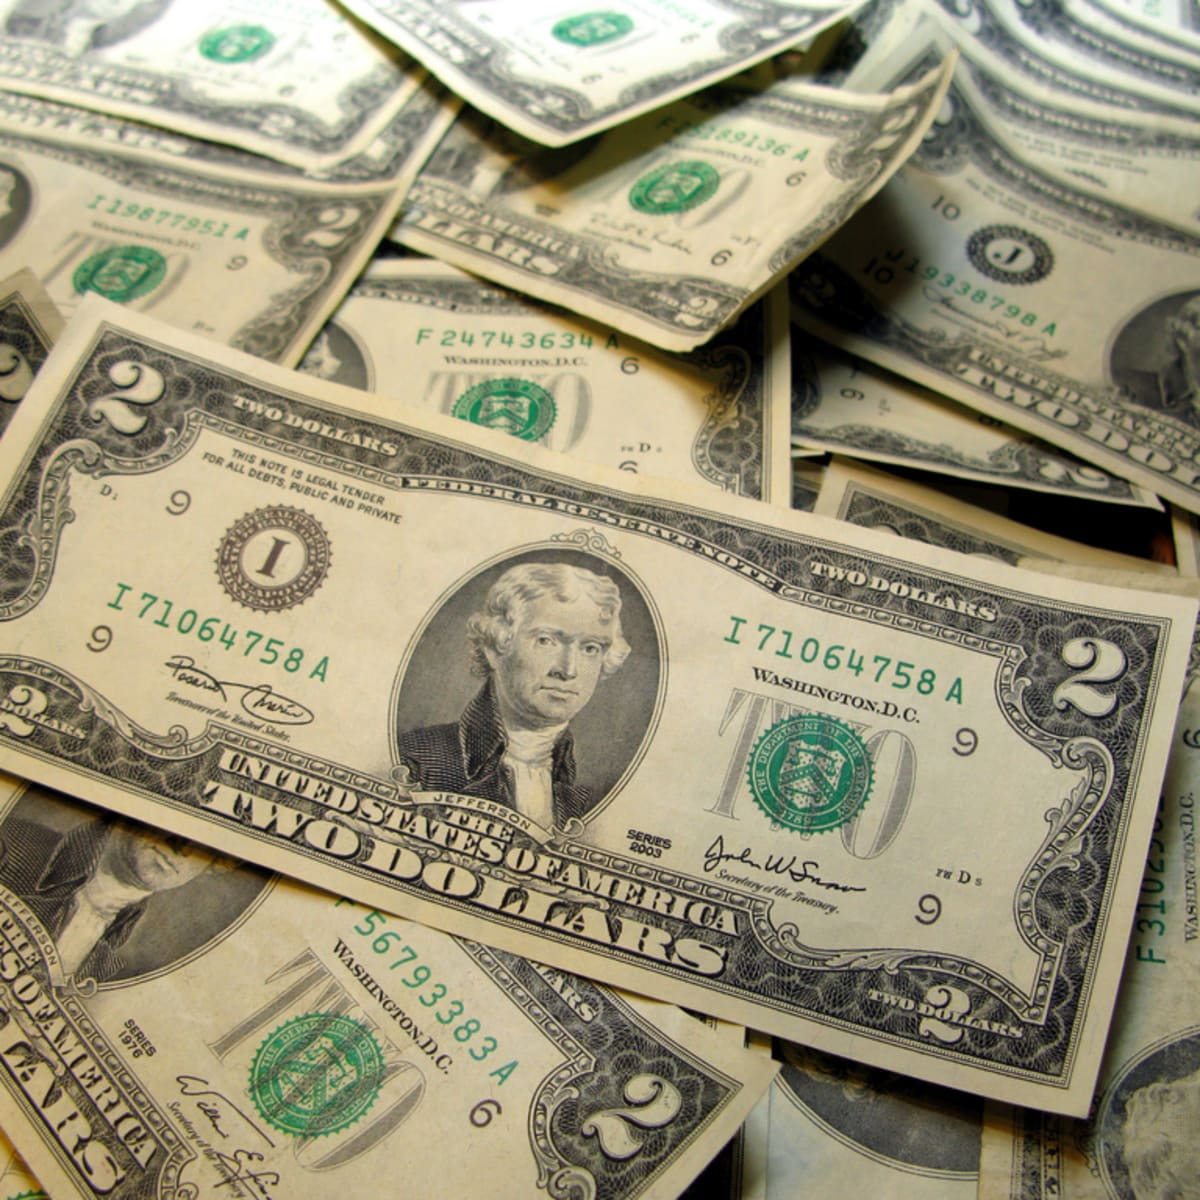 Happy Birthday Million Dollar Bills Makes a Fun Birthday Gift Set of 100 Bills